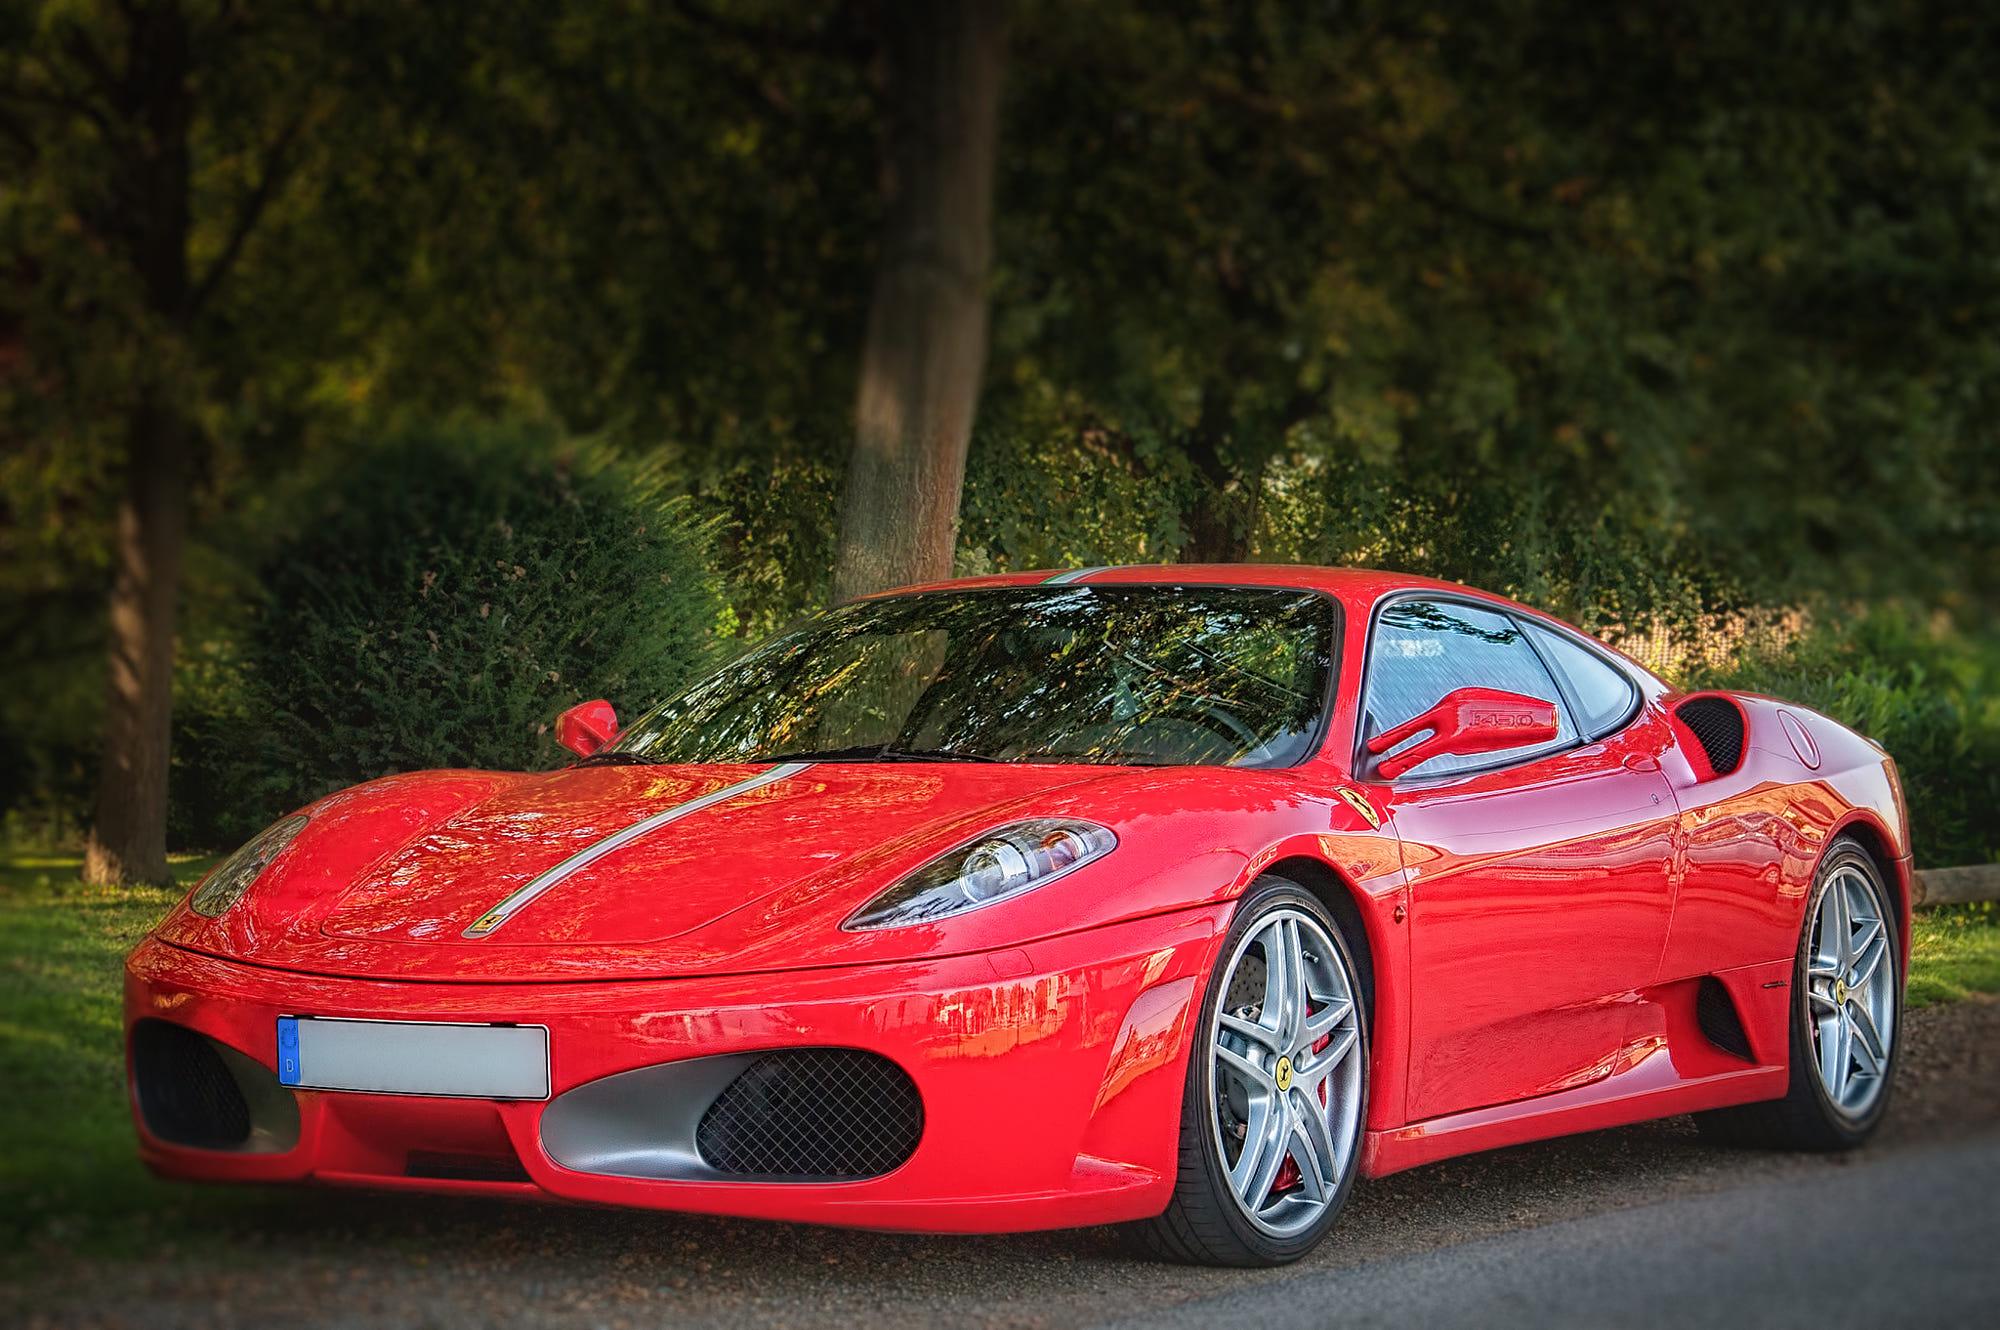 Ferrari F45 by Peter Kaul - Photo 136458857 / 500px